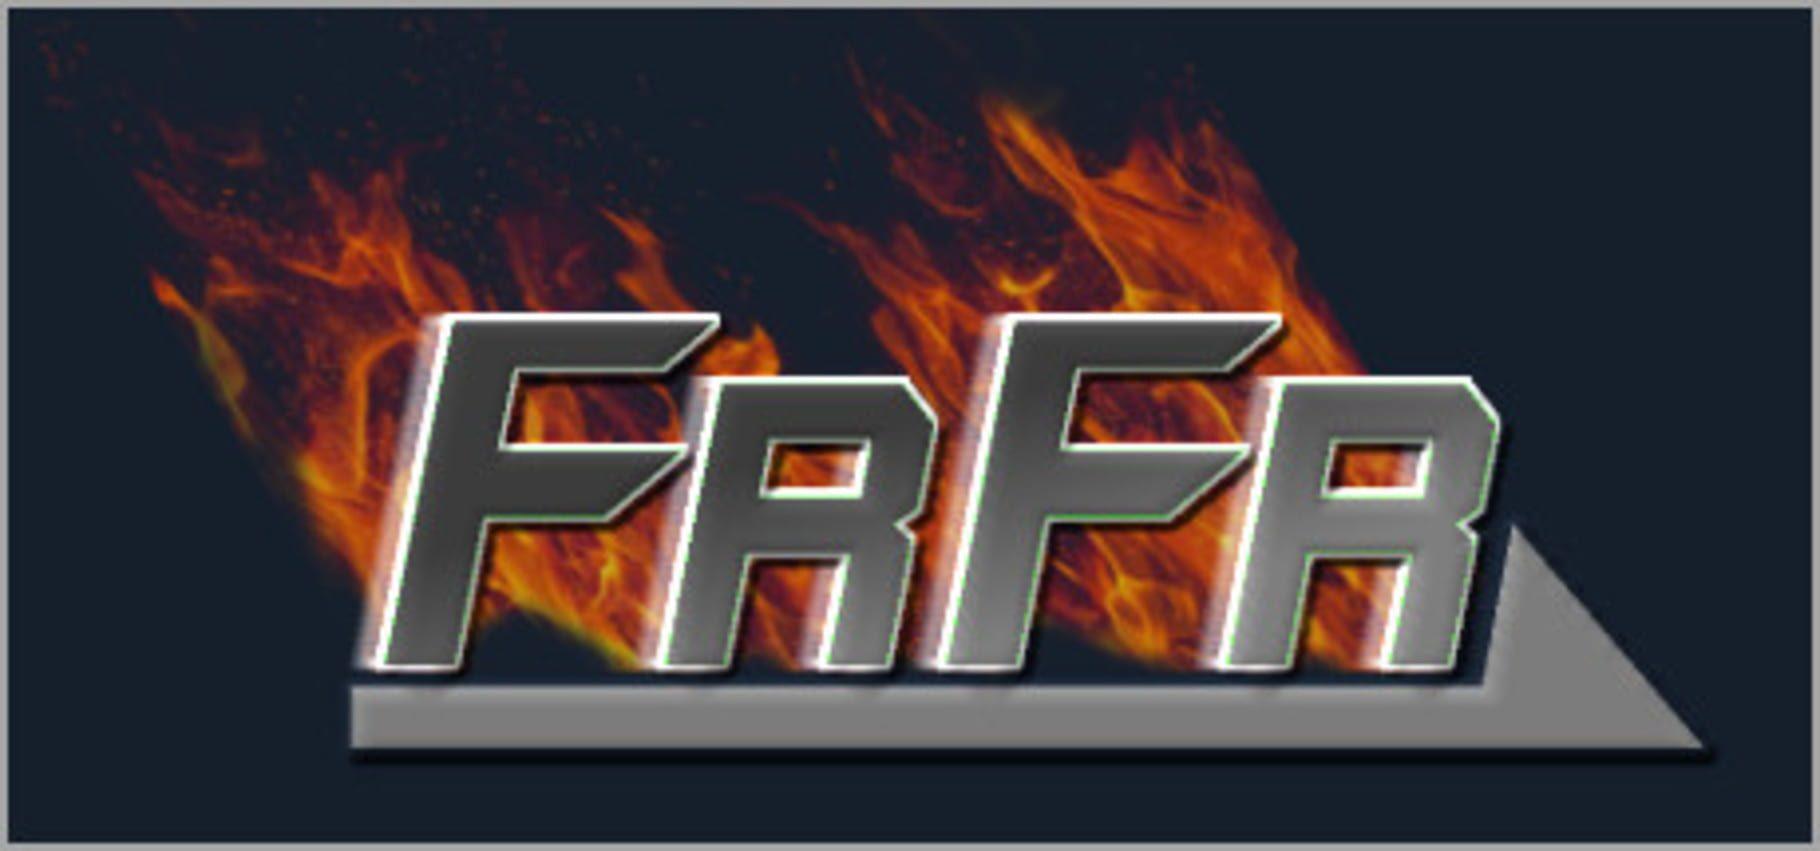 buy Frantic Freighter cd key for all platform